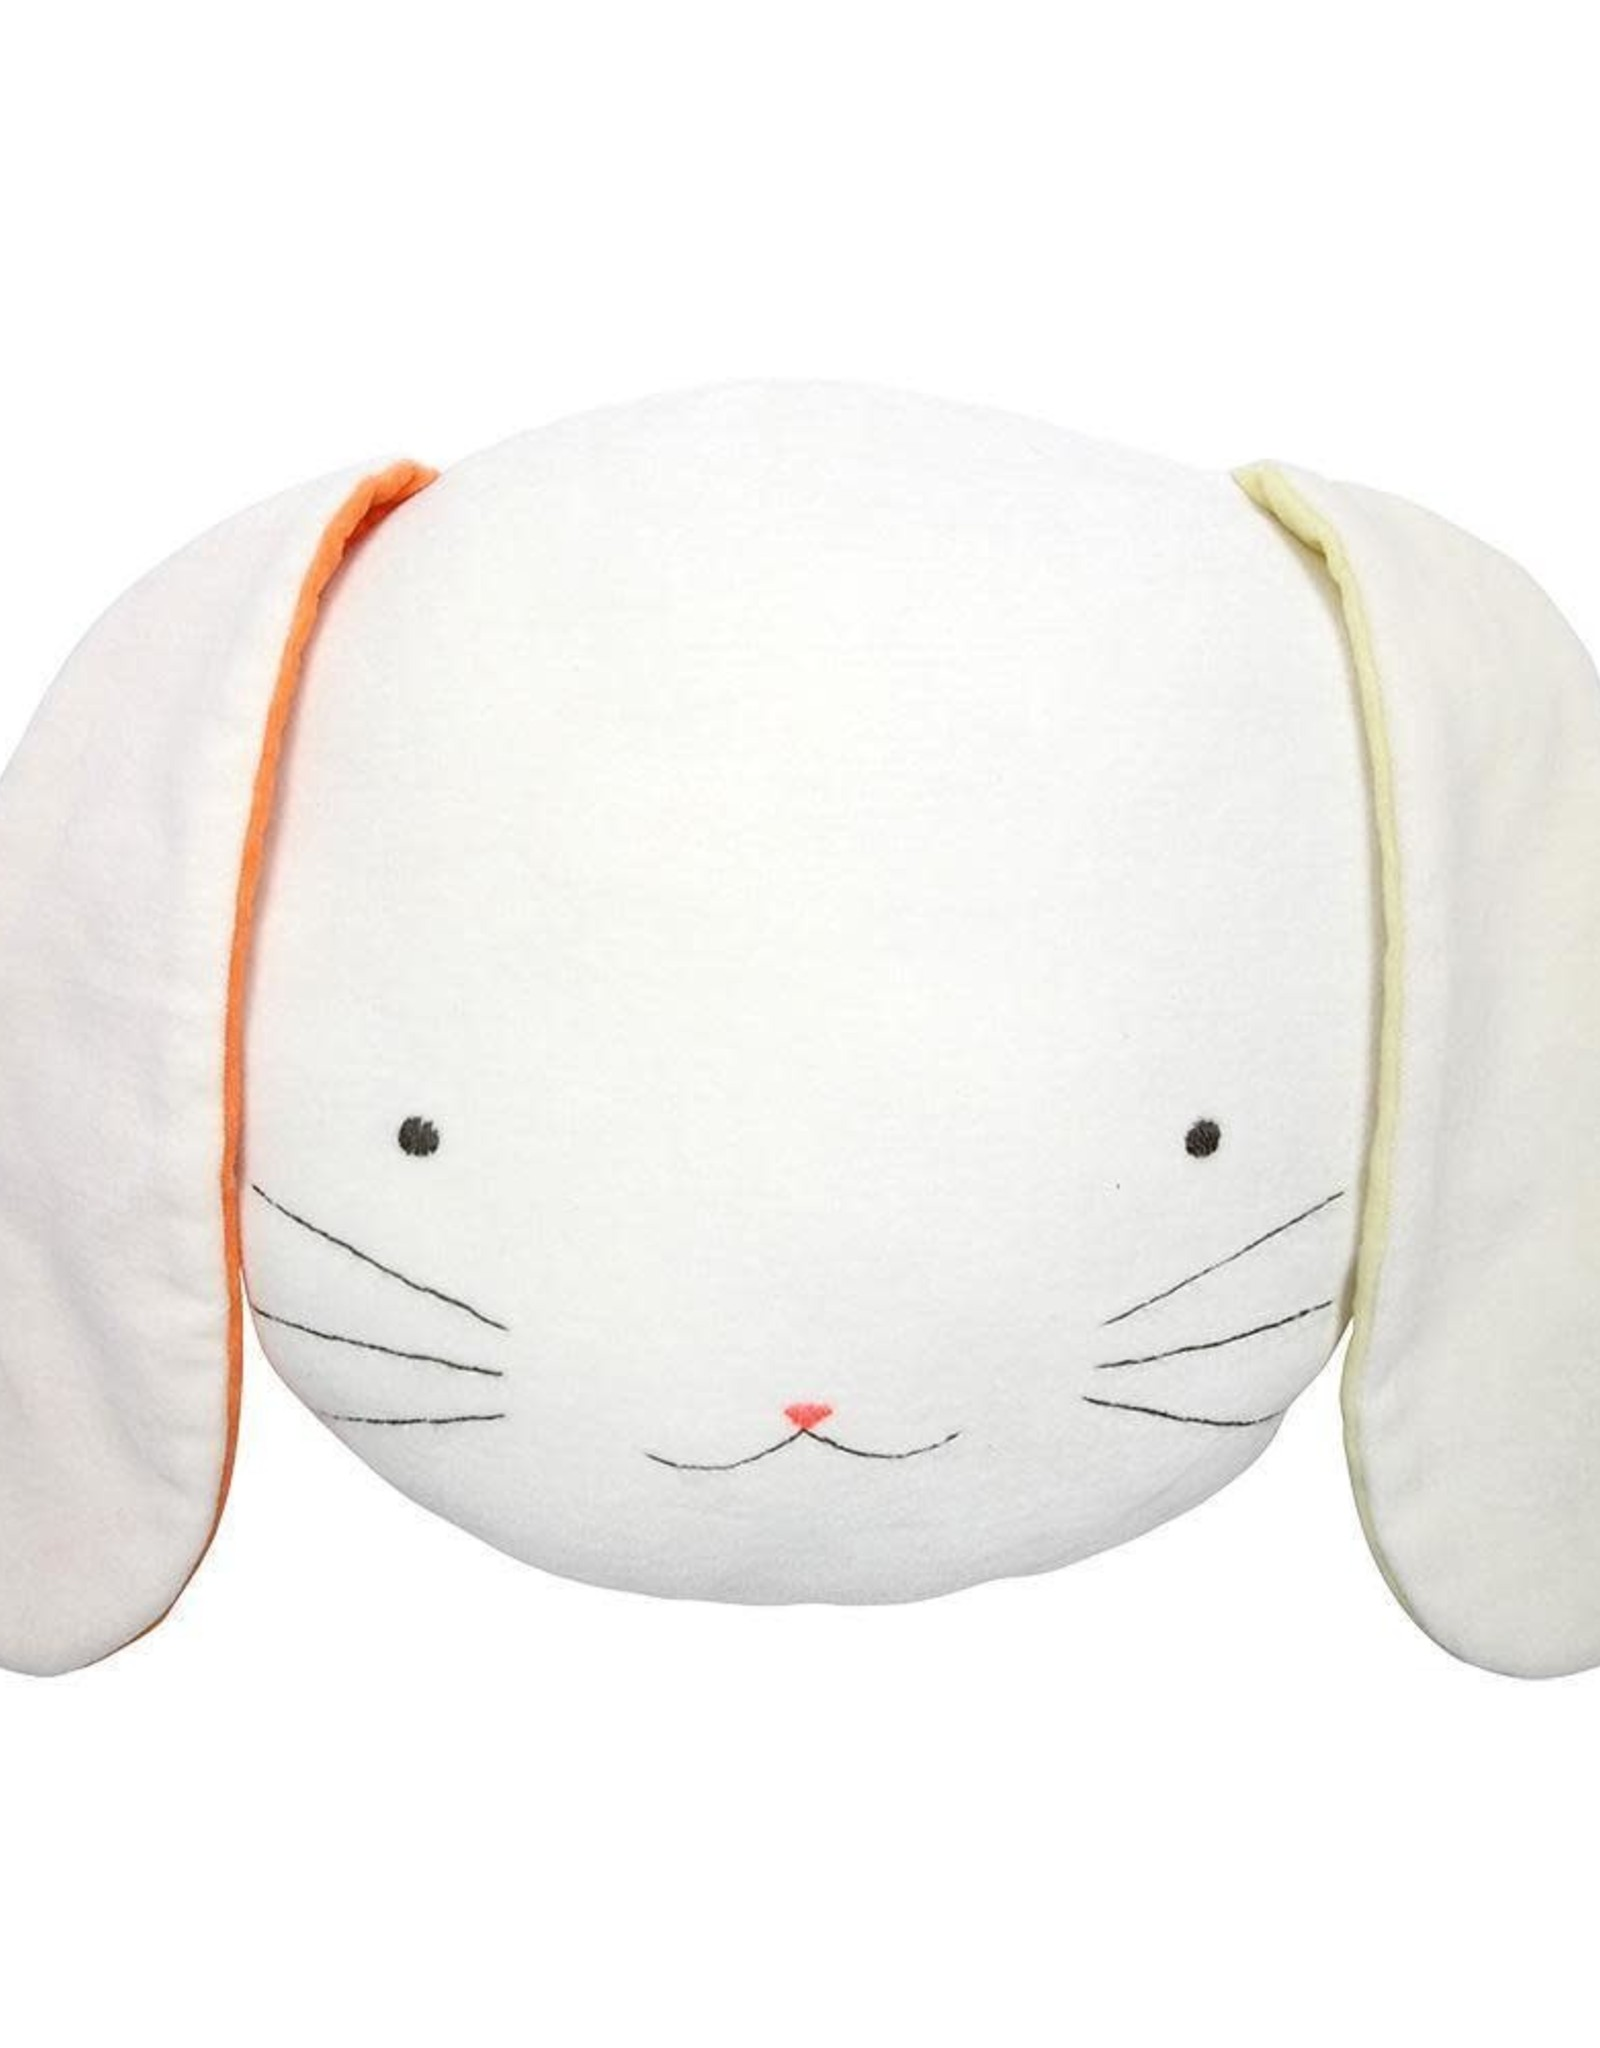 Meri Meri Velvet Bunny Cushion